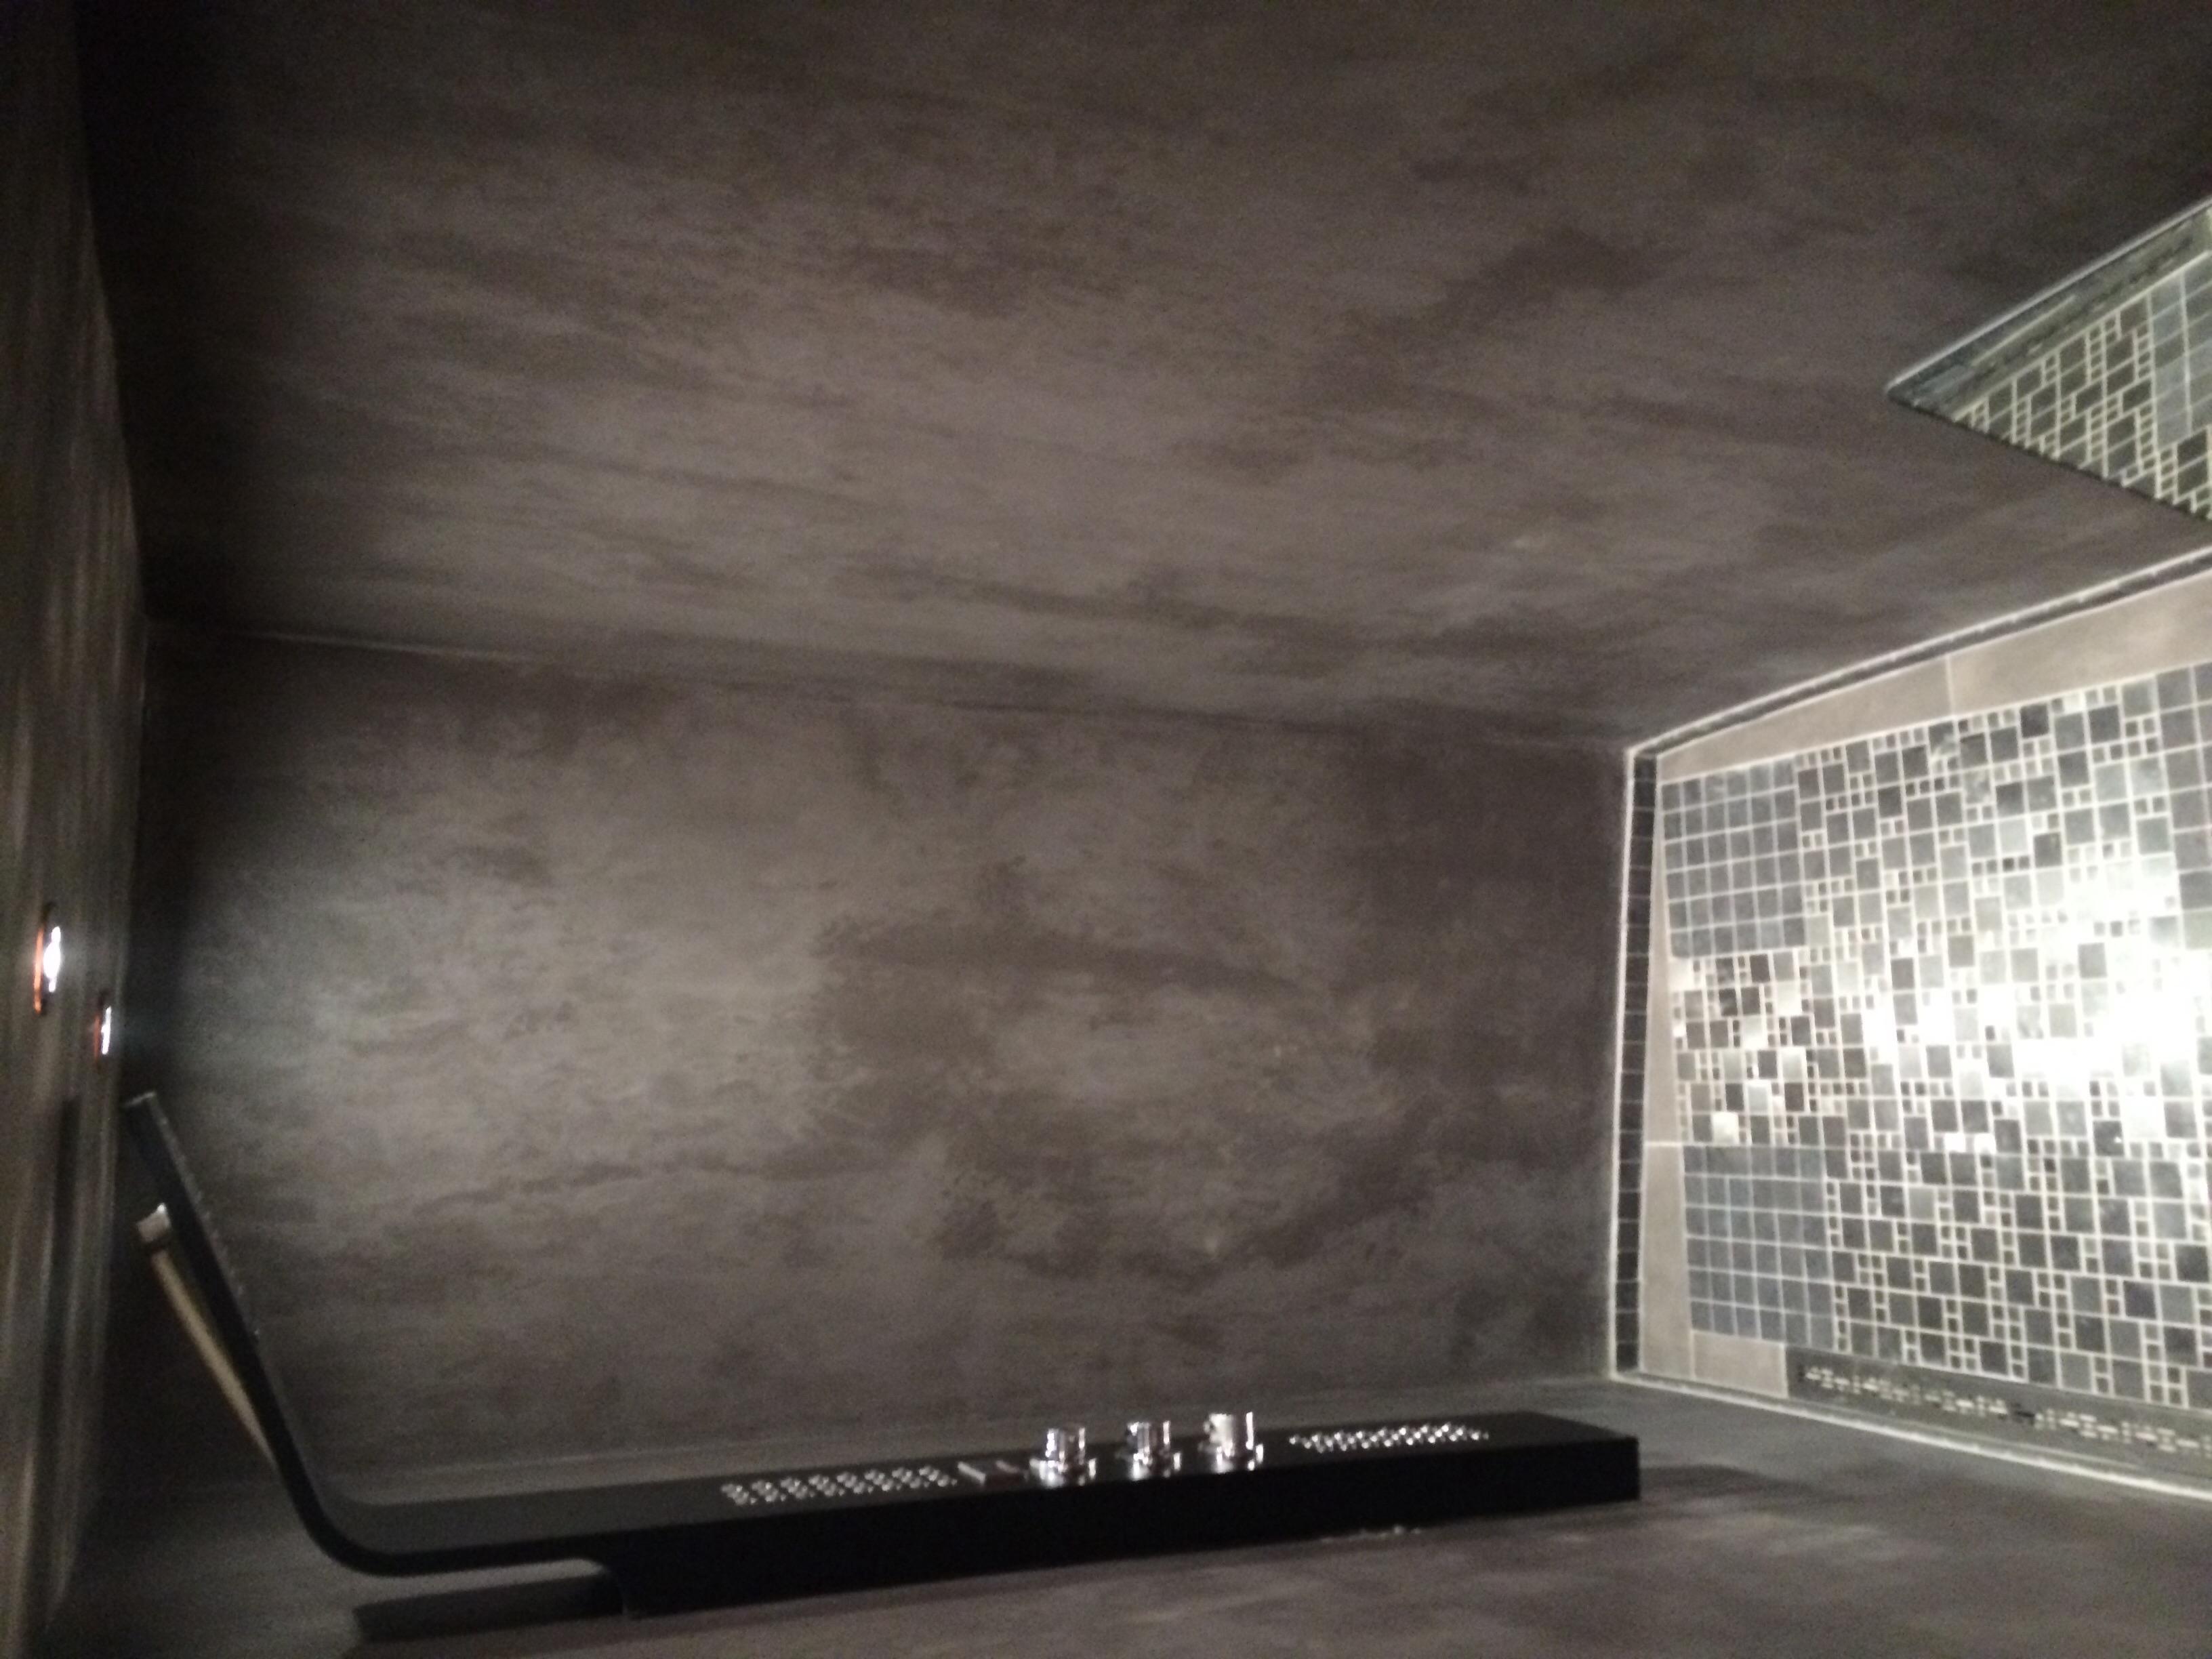 Béton Ciré Plan De Travail Cuisine Leroy Merlin Impressionnant Galerie sol Beton Cir Elegant Awesome Amazing Bton Cir sol Mur U Plafond